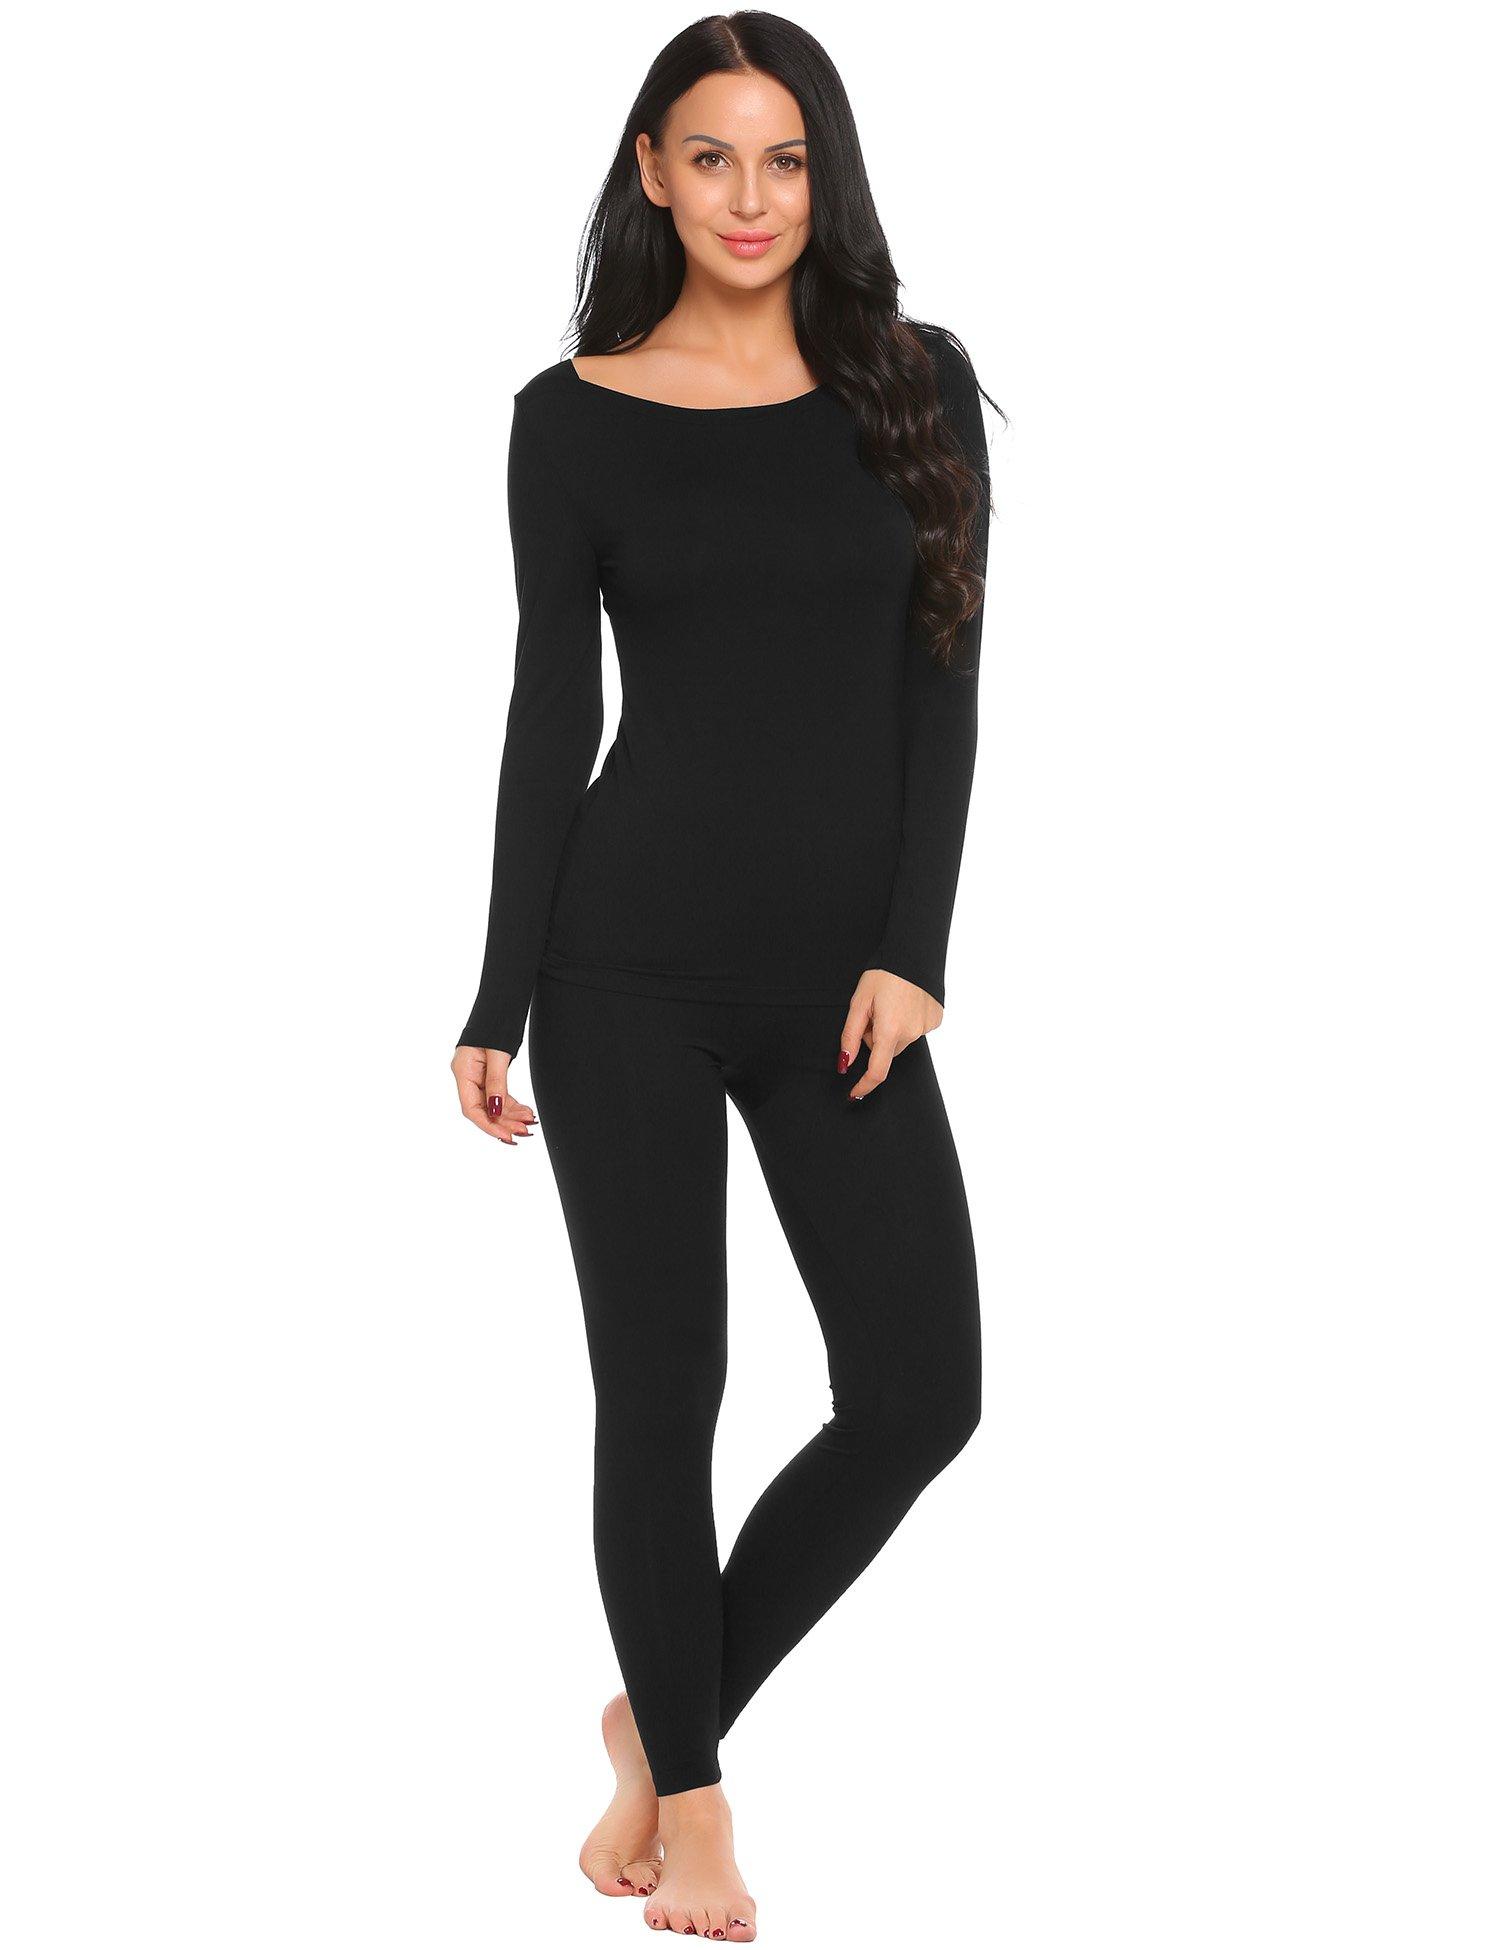 Ekouaer Womens Long Johns Thermal Underwear Set Base Layer Top and Pants,Black(7893),XX-Large